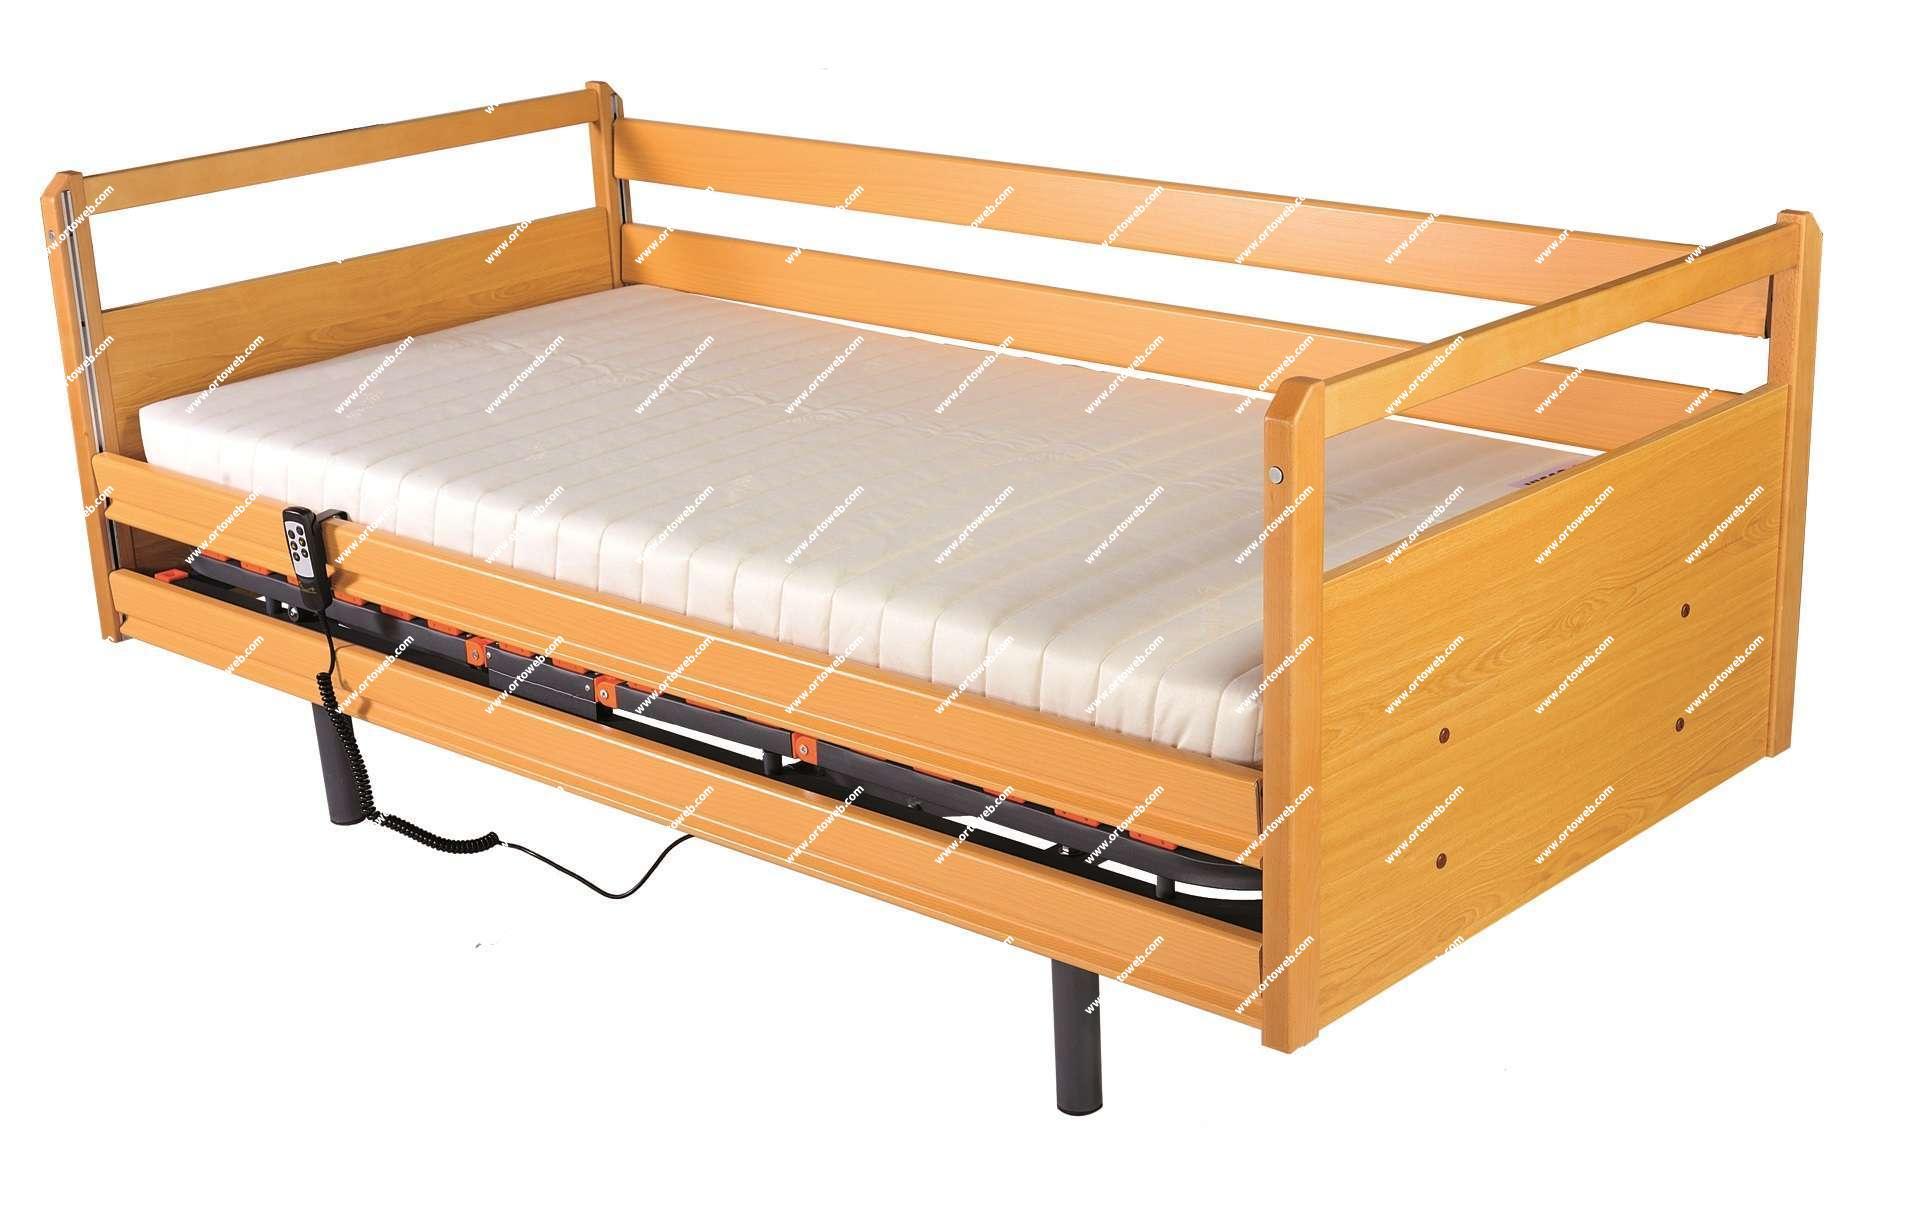 Cama articulada el ctrica geria 4 planos de 90cm kit for Dimensiones cama nido